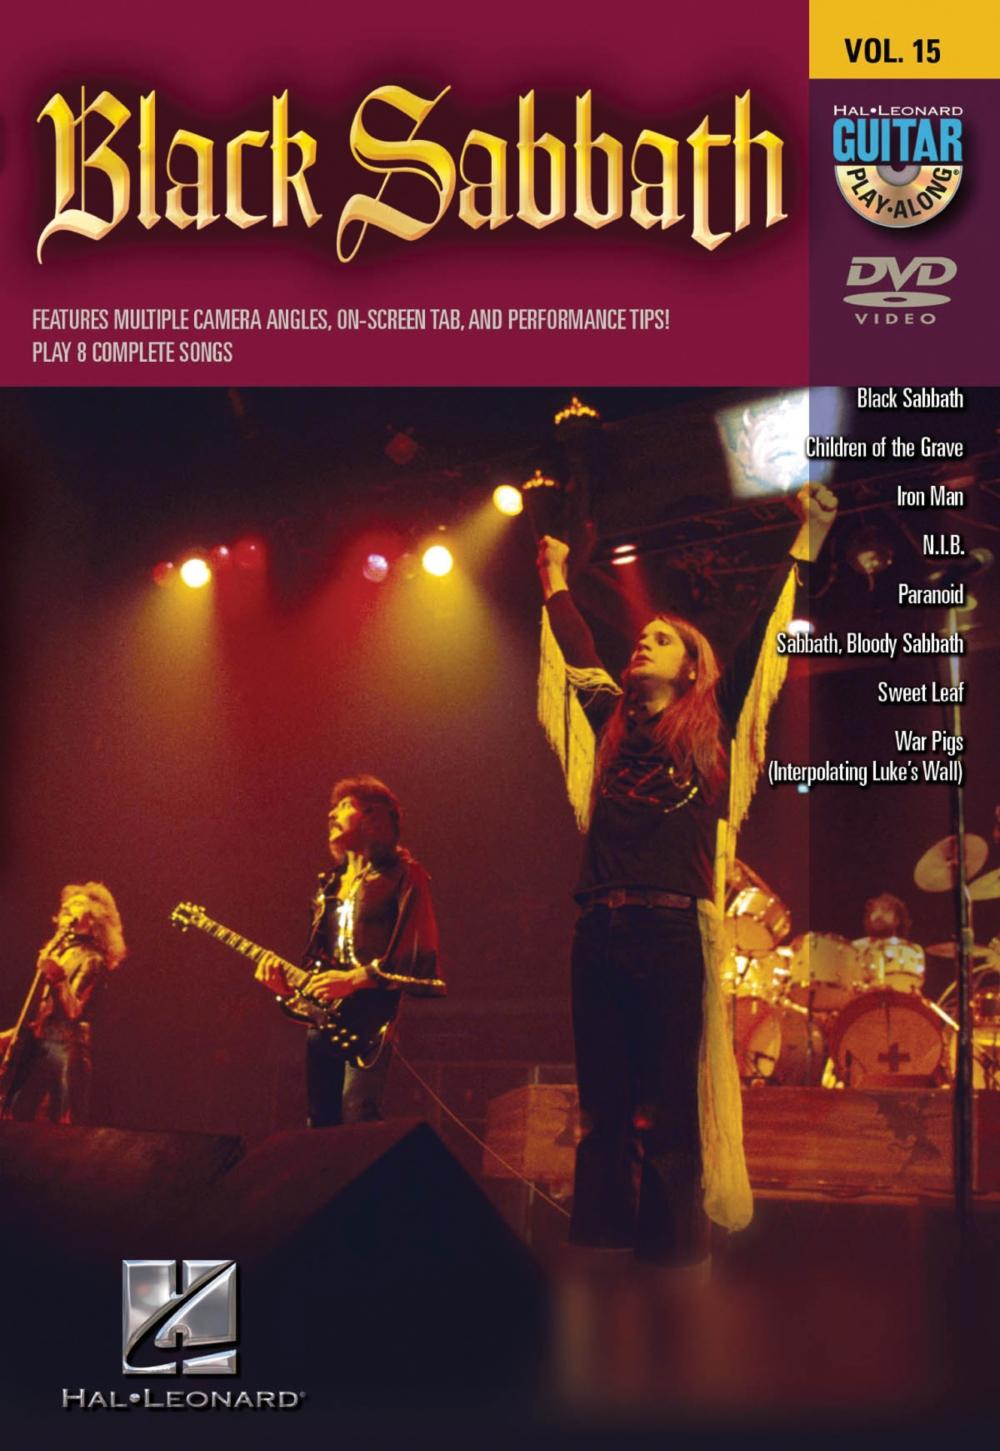 Hal Leonard Black Sabbath Guitar Play-Along Series Volume 15 DVD by